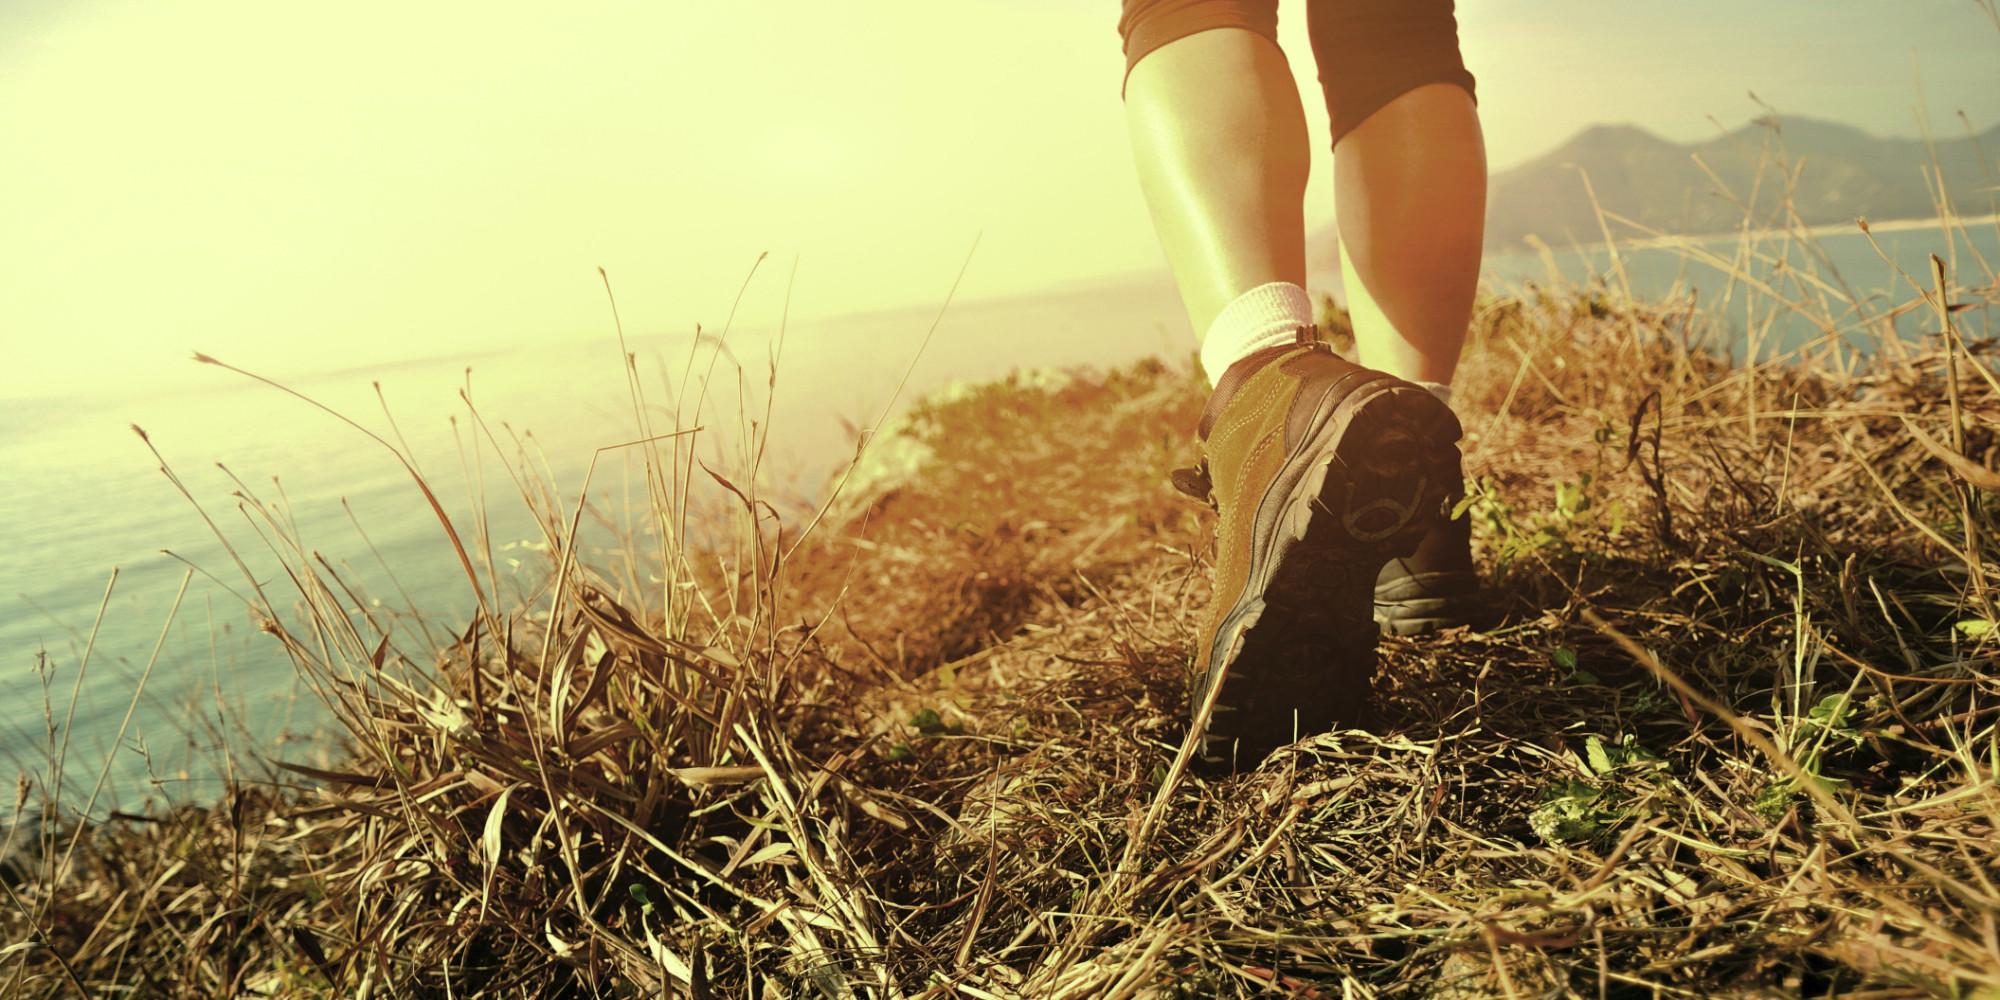 walking nature quotes joy walks feet literary helpful huffpost